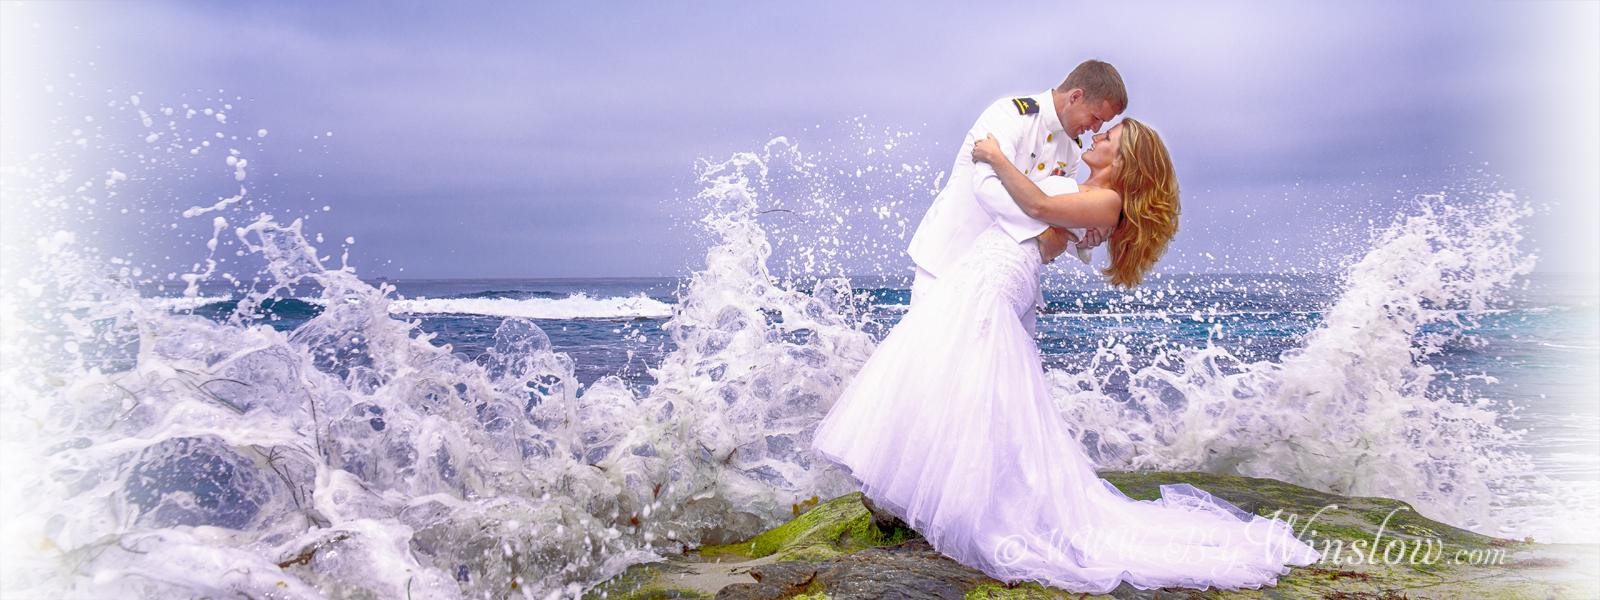 Garret Winslow- bywinslow.com Weddings130427-G8W_4277-Edit_HDR-Edit-Edit-Millitary_Surf